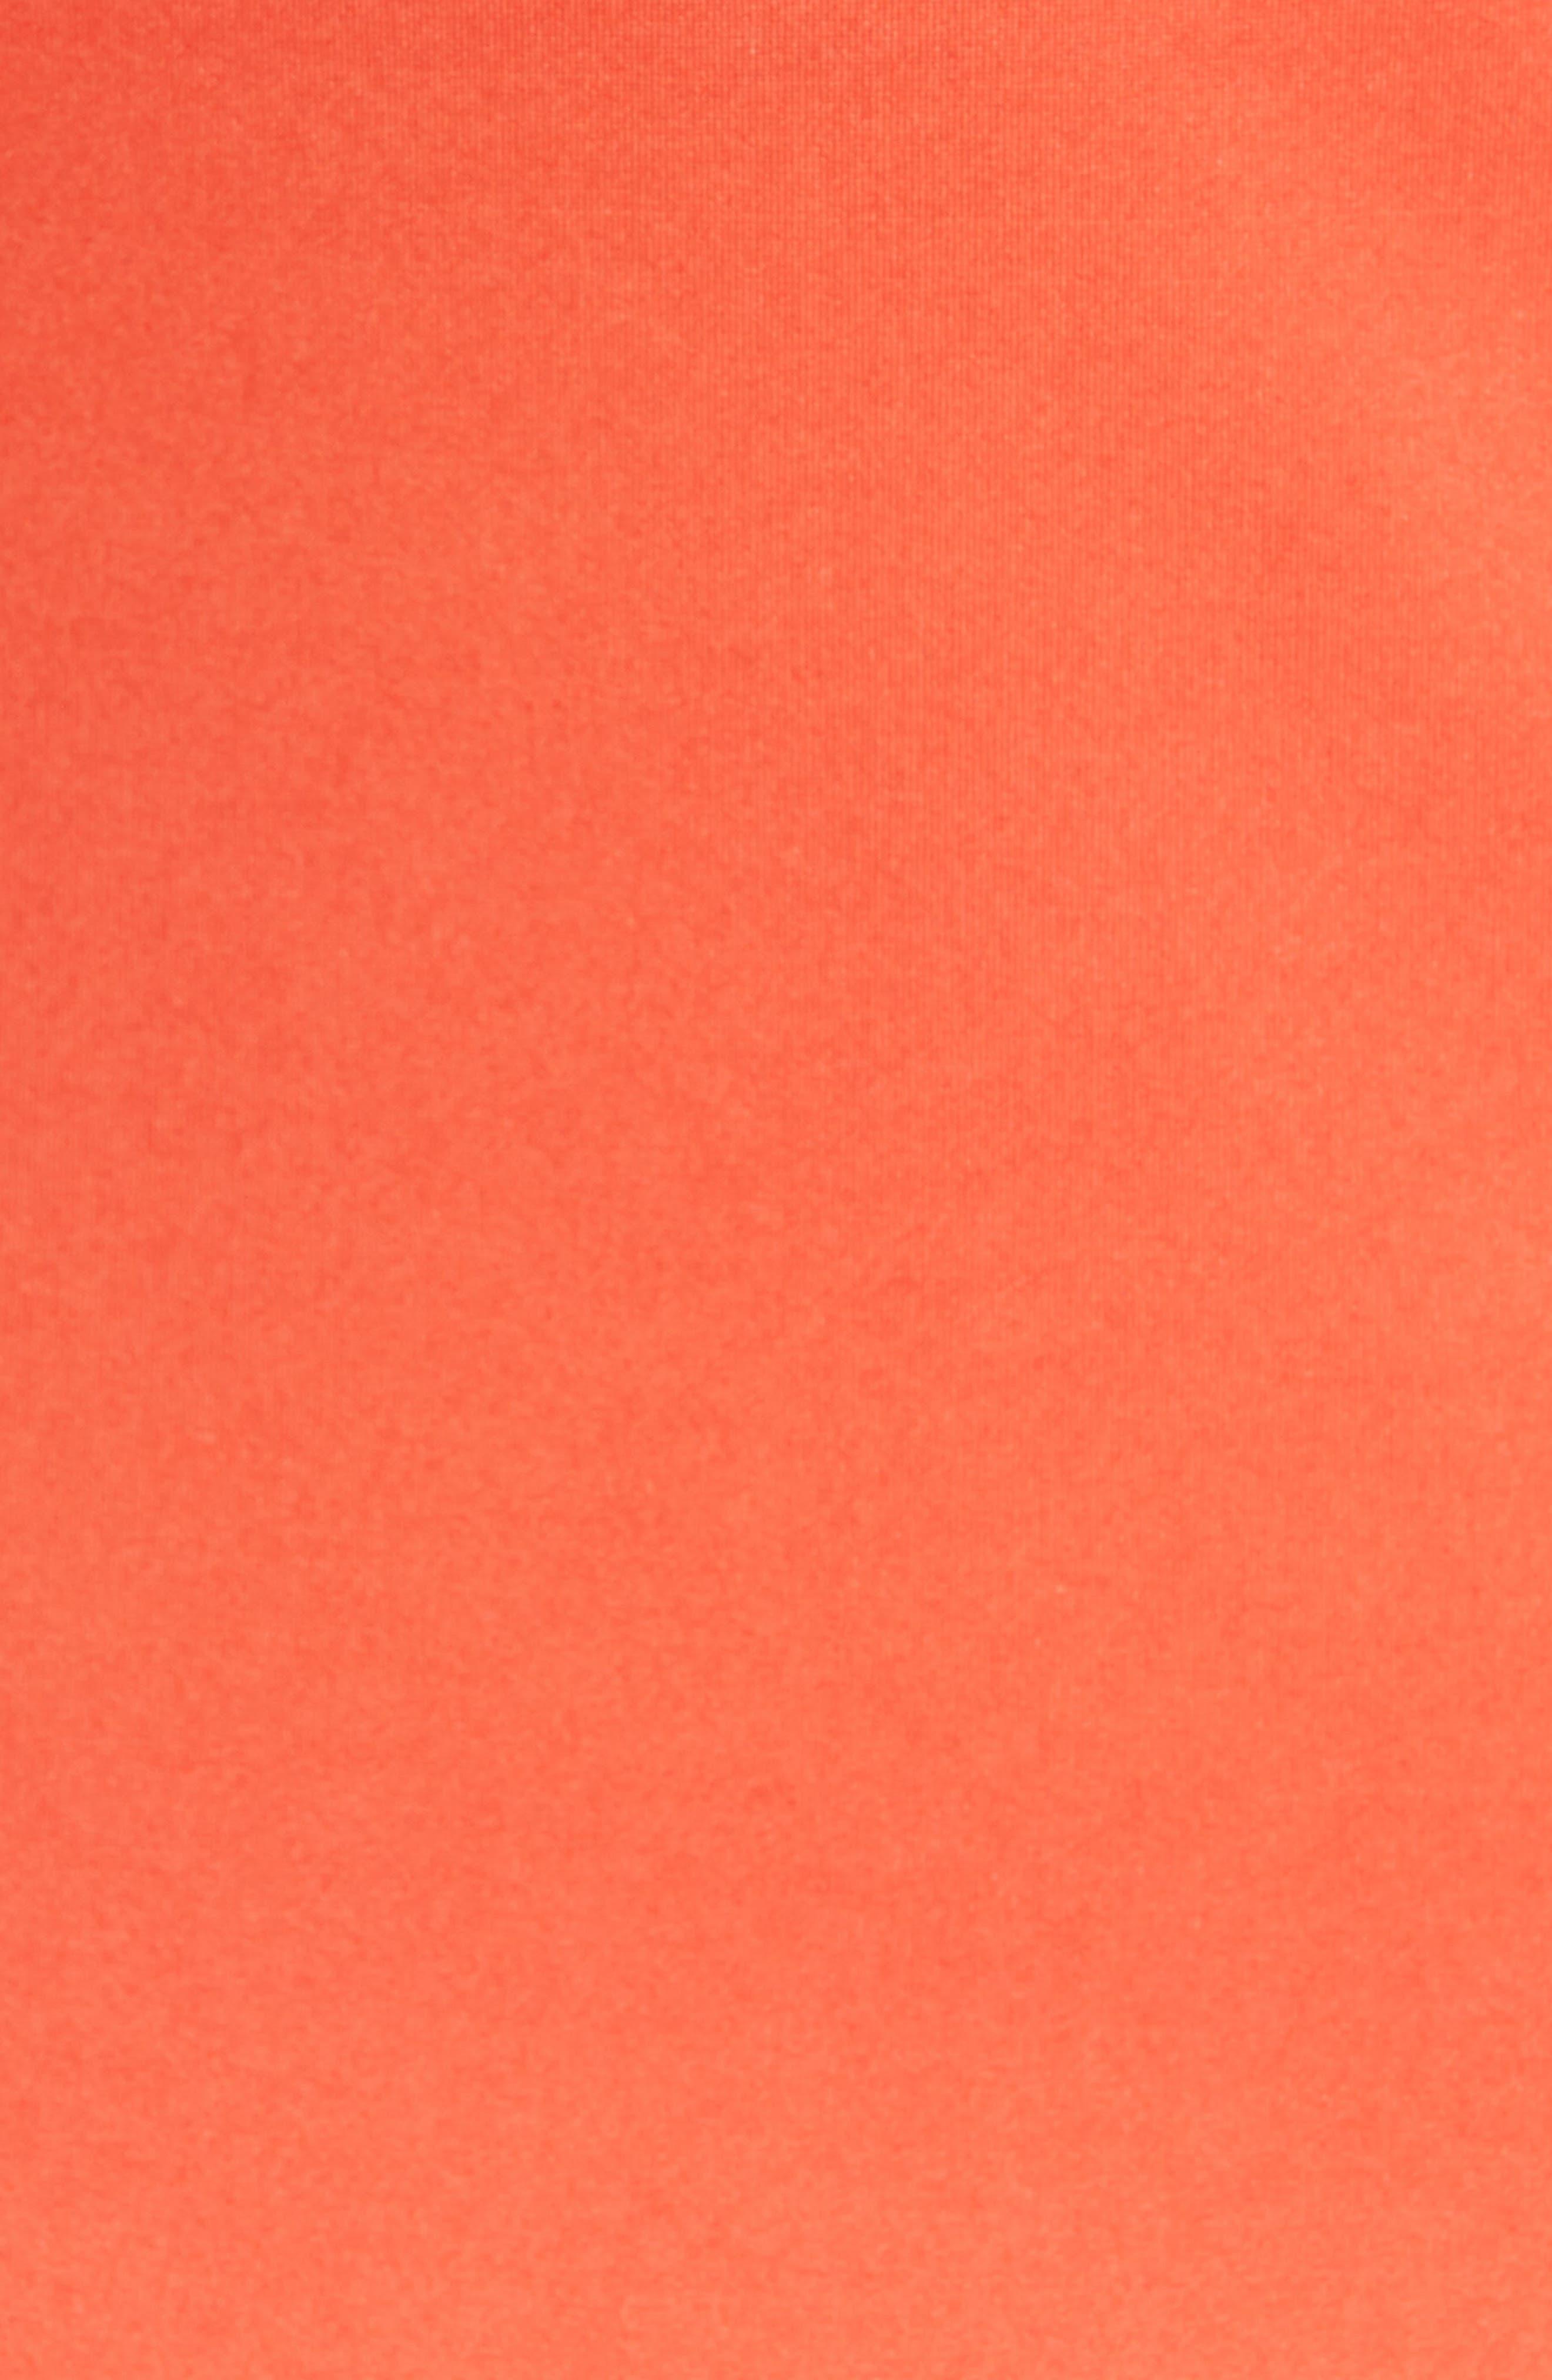 Profilic One-Piece Swimsuit,                             Alternate thumbnail 5, color,                             600